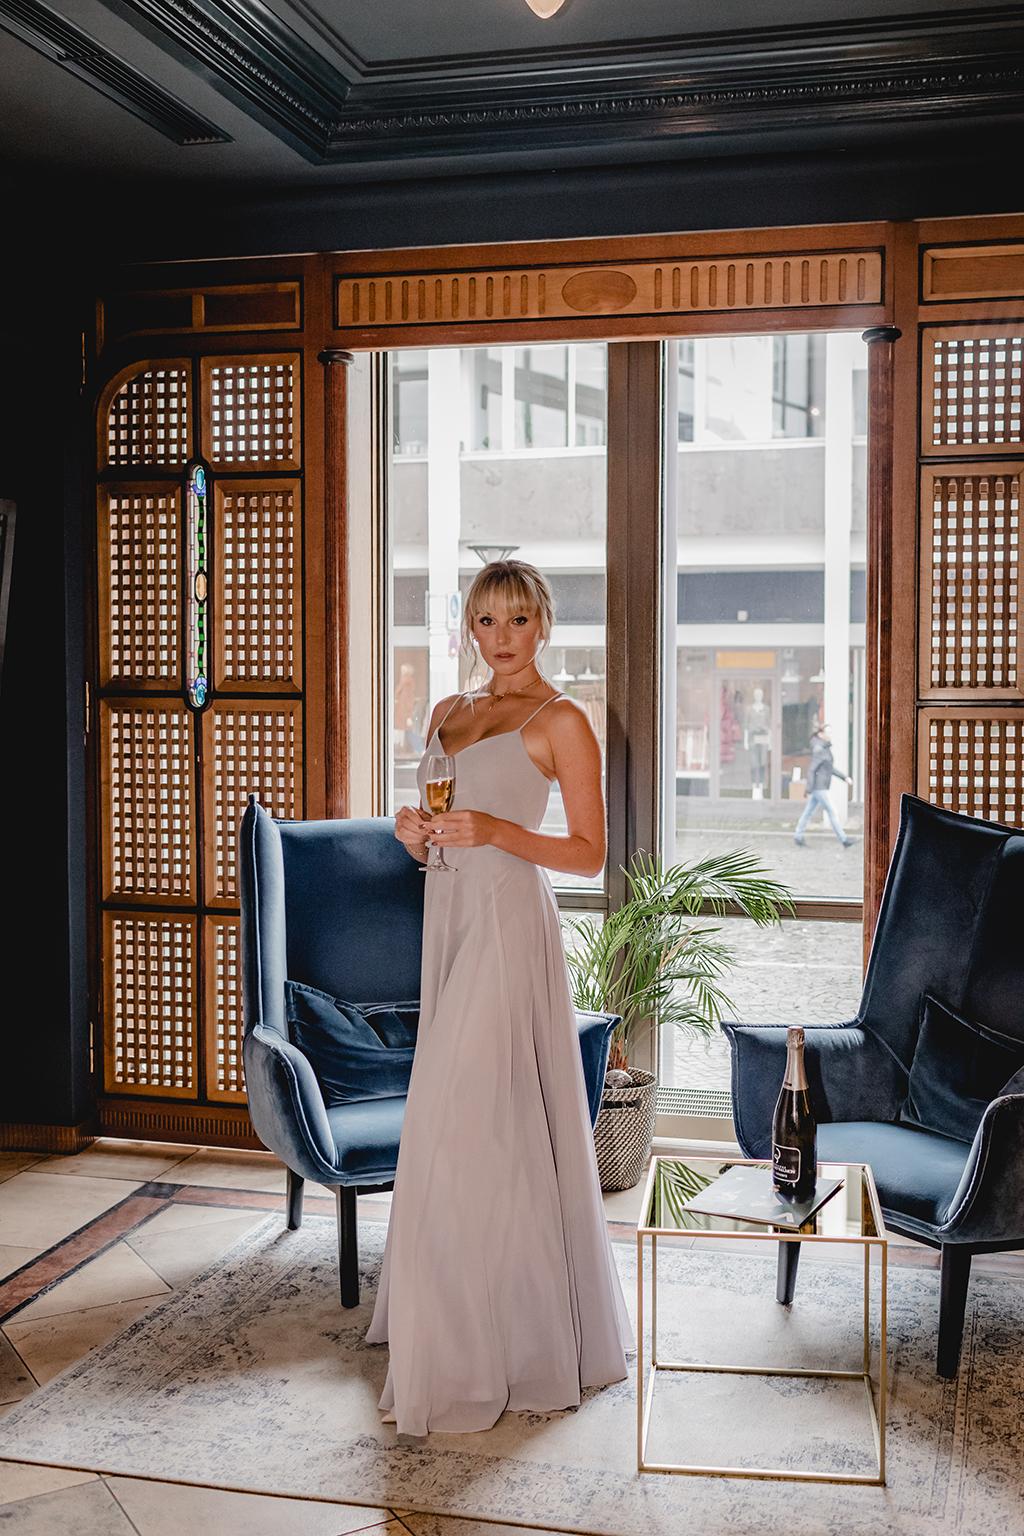 Fließender Stoff mit spaghettiträger Abschlusskleid, Abiballkleid, Abendkleid - Feelings Braut & Festmoden